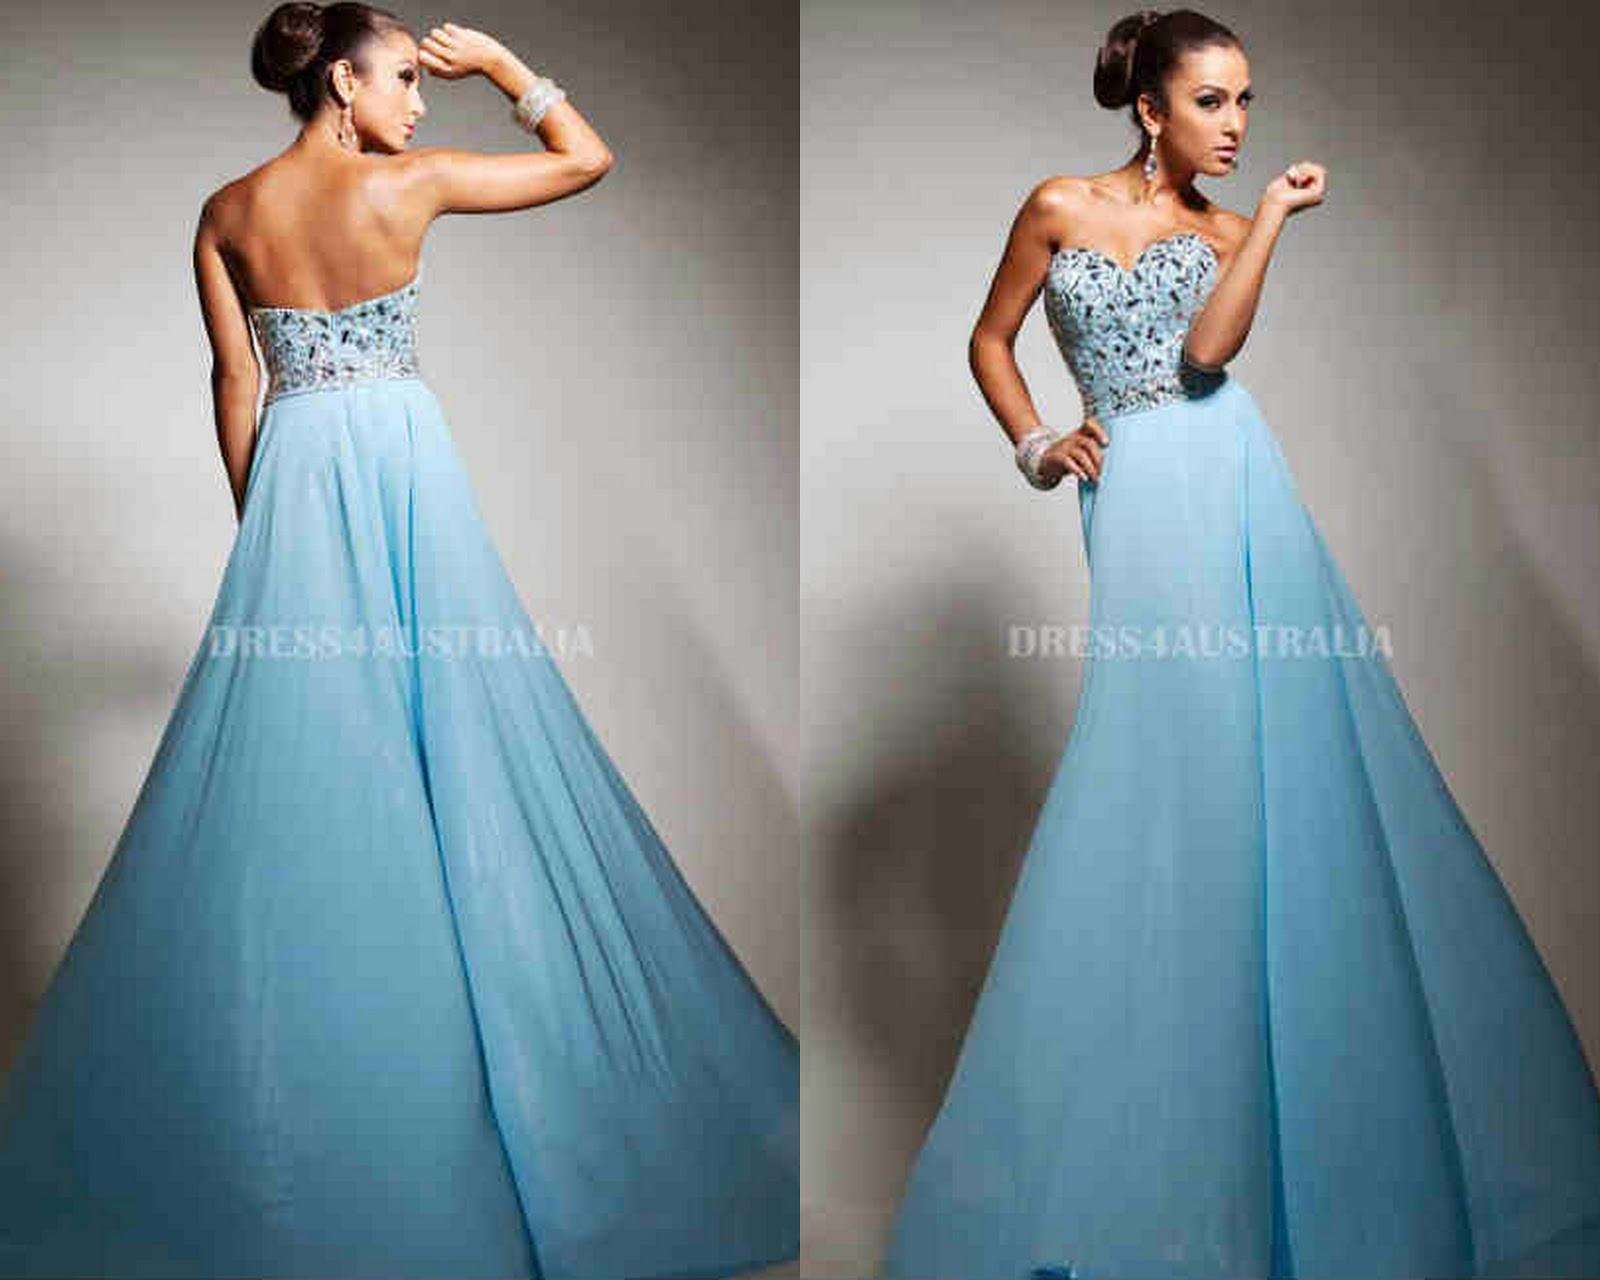 EveryMom\'sPage: Choosing the Perfect Prom Dress @Dress4Australia